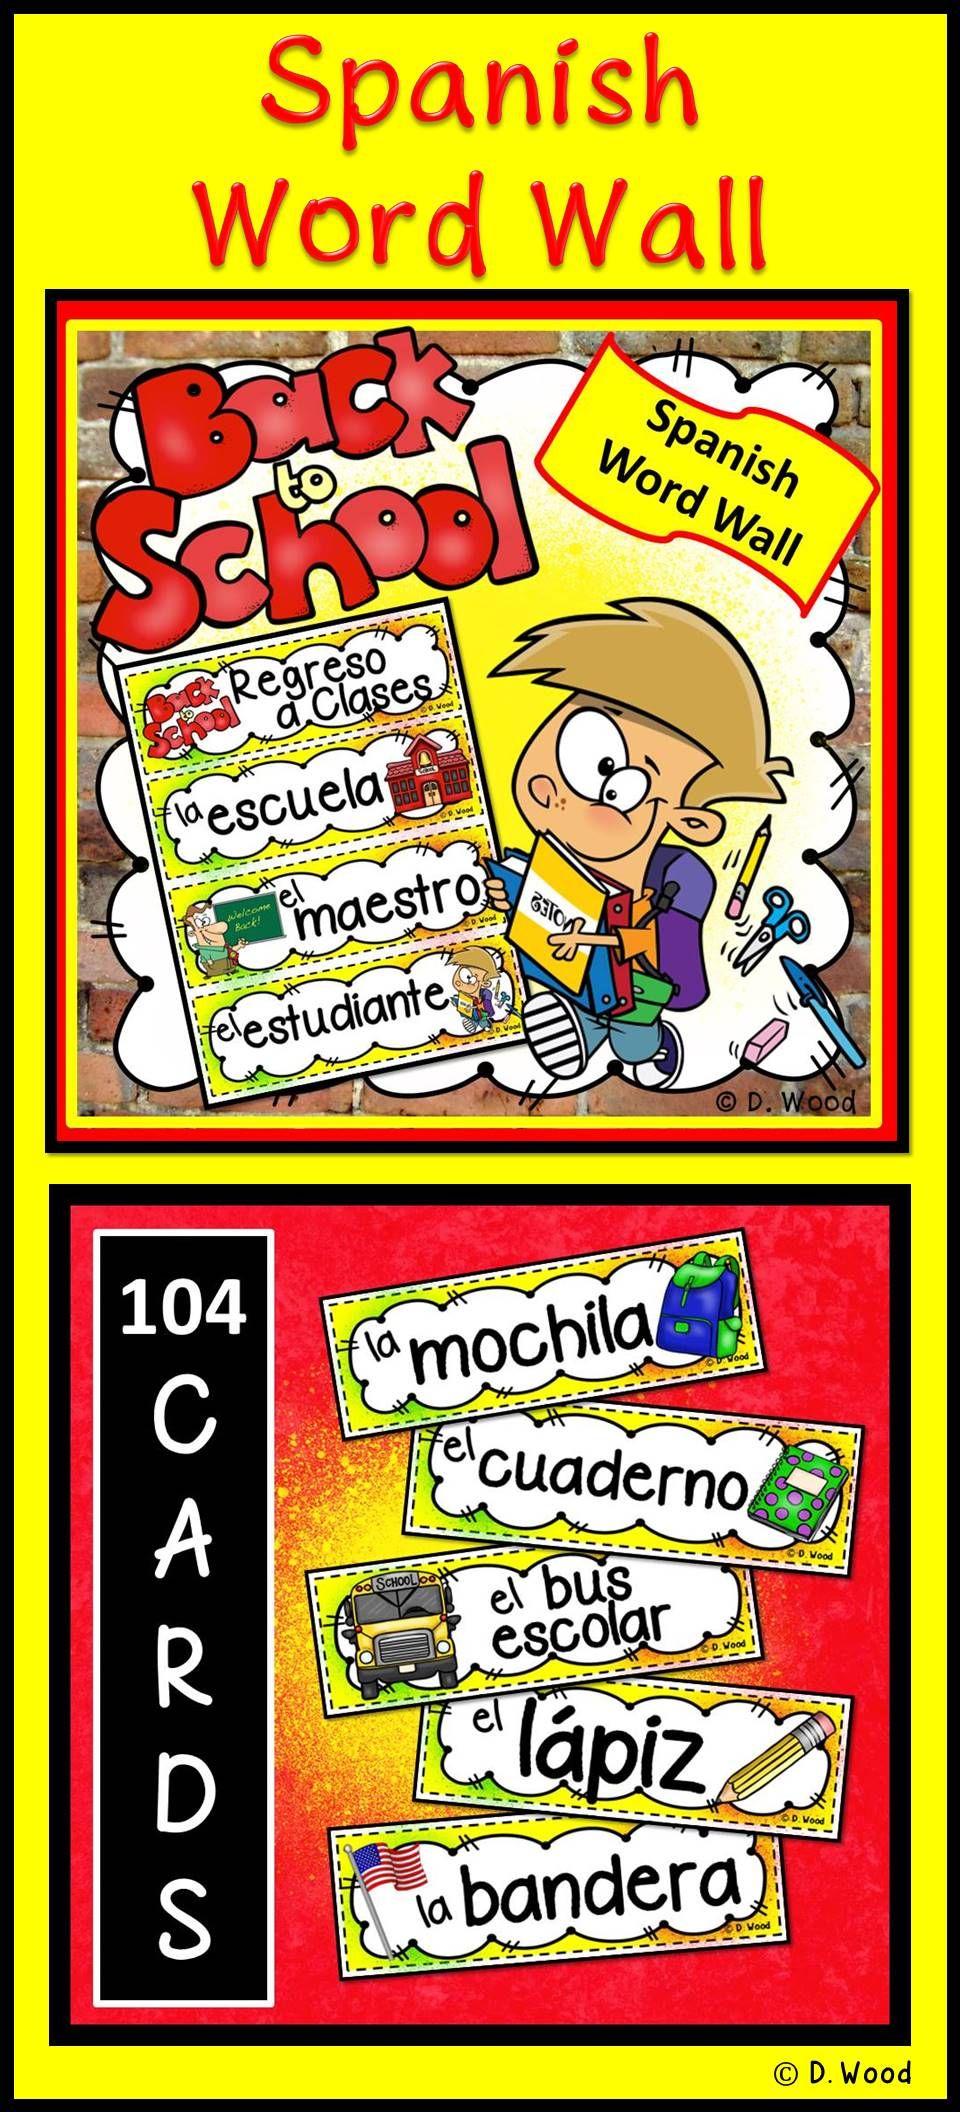 Spanish Classroom Decor Word Wall: Regreso a Clases | Spanish word ...